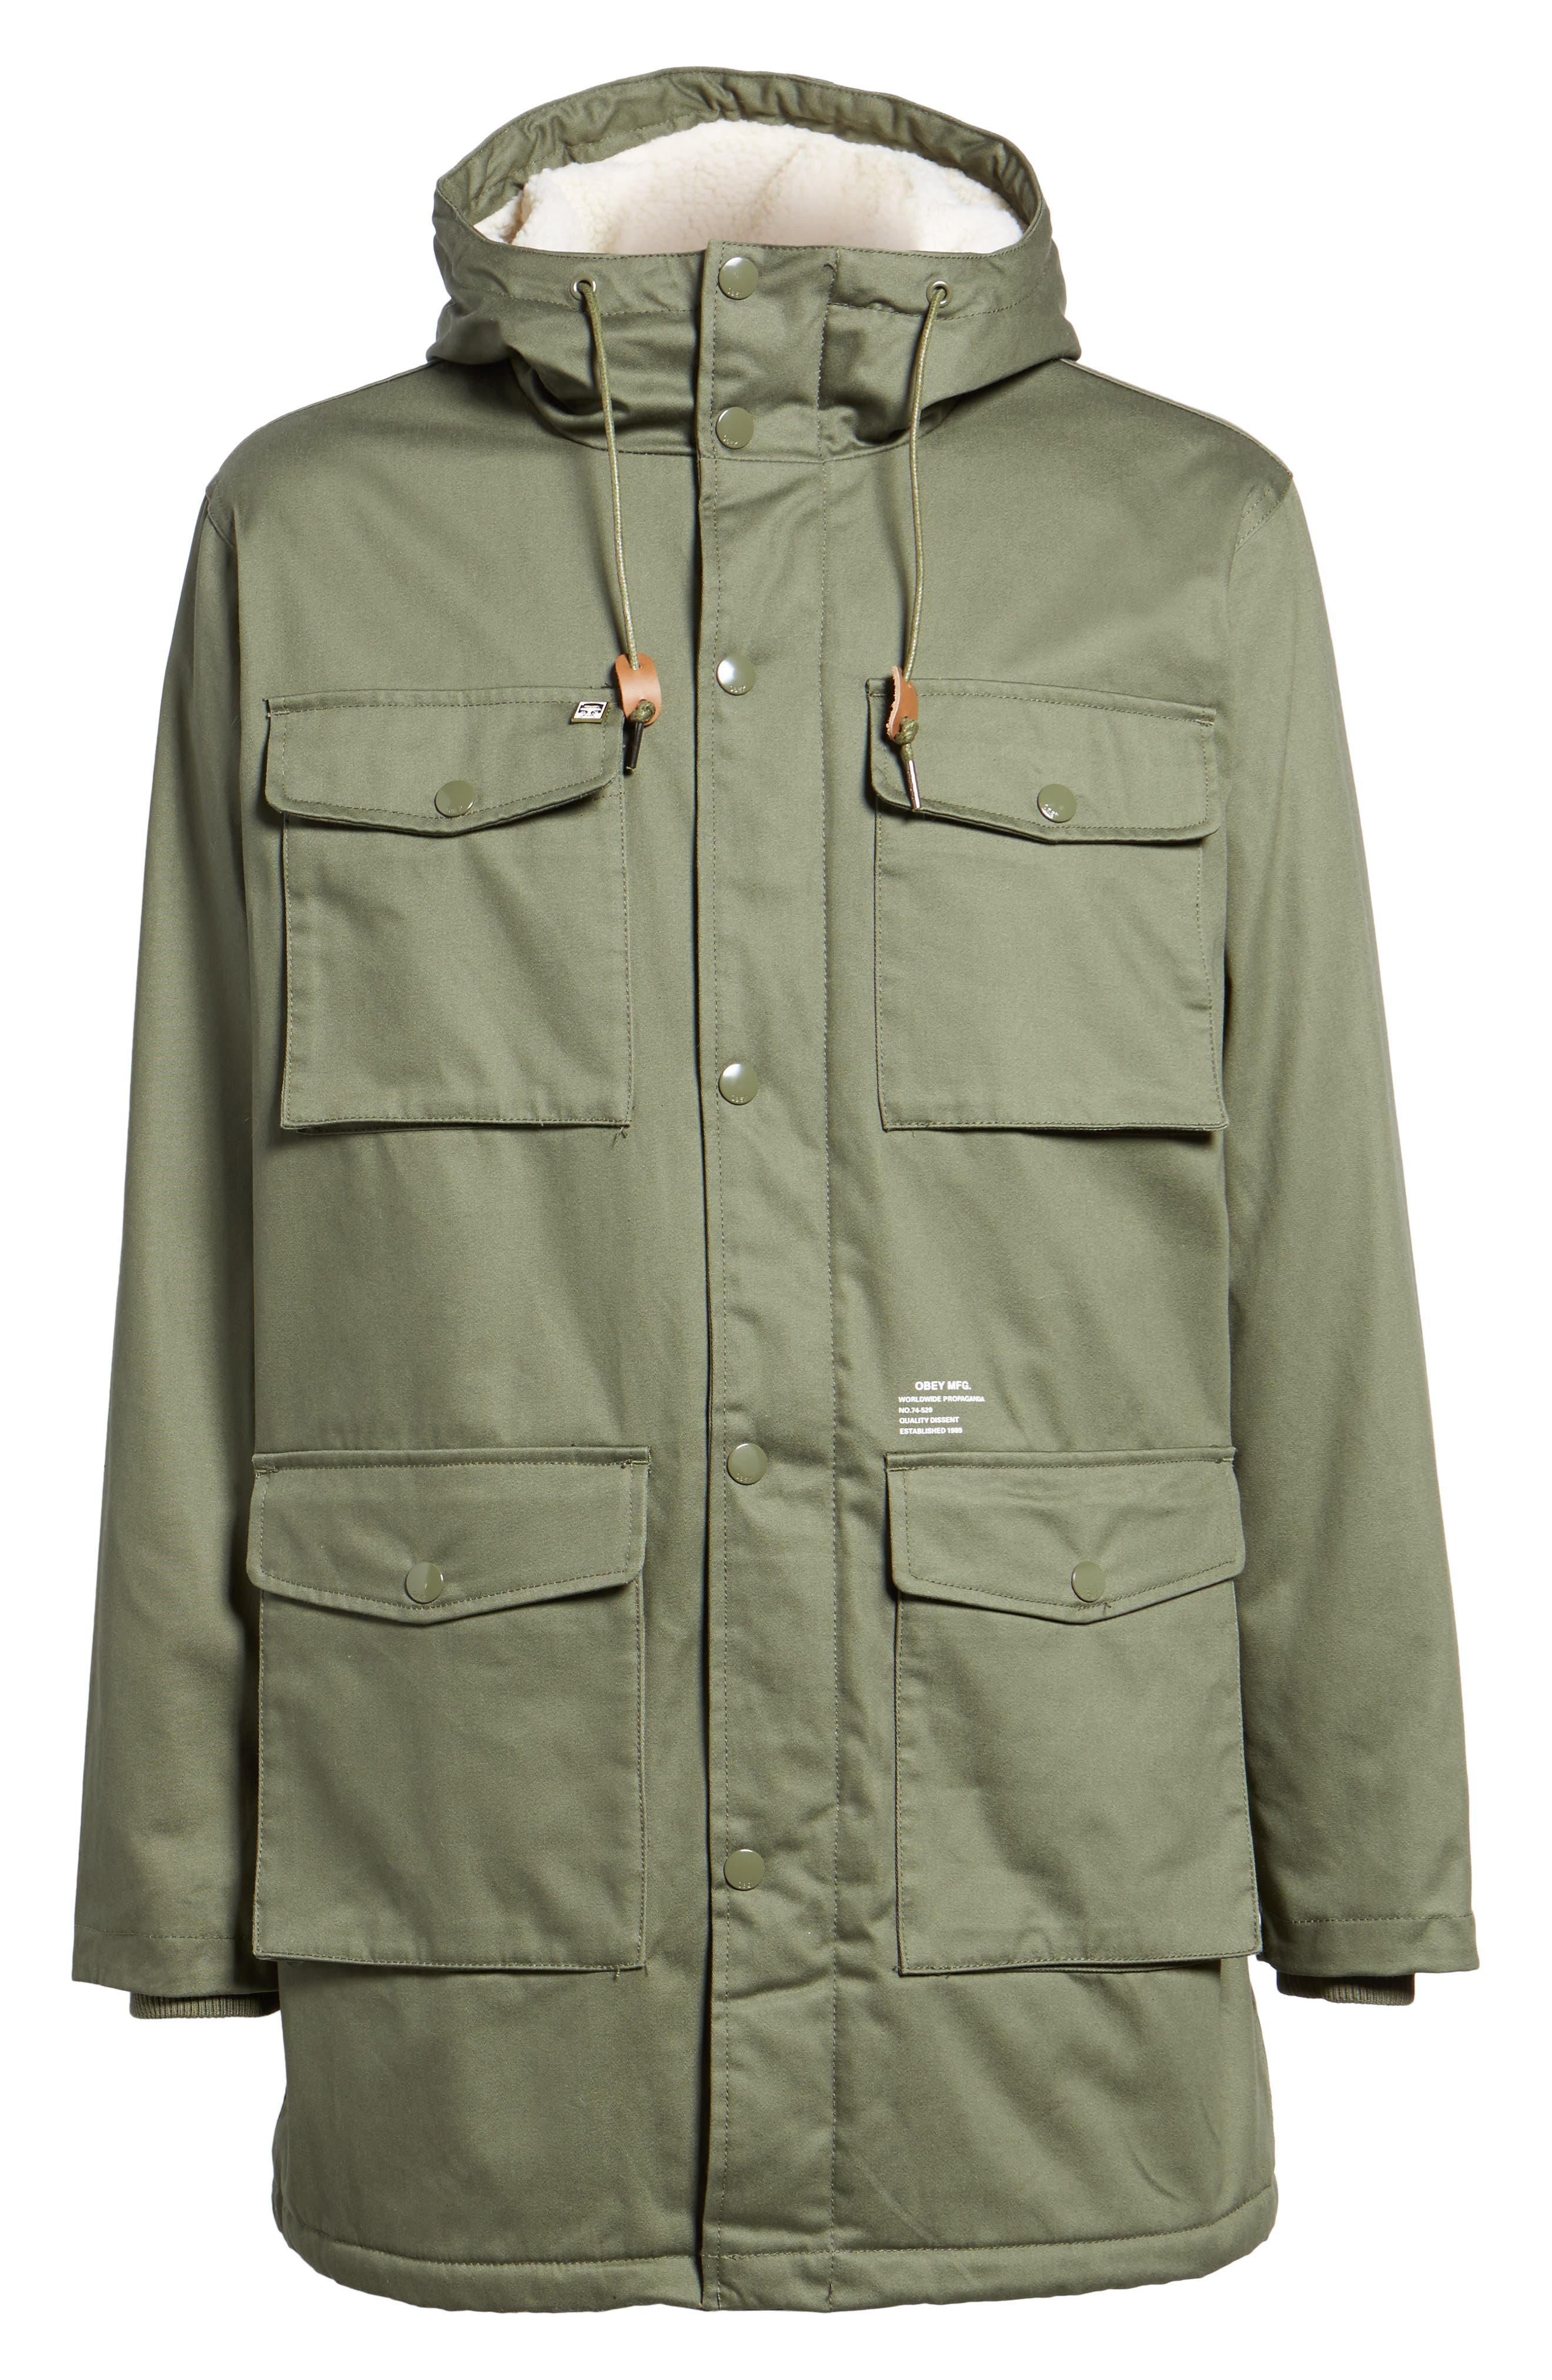 Heller II Jacket,                             Alternate thumbnail 6, color,                             Army